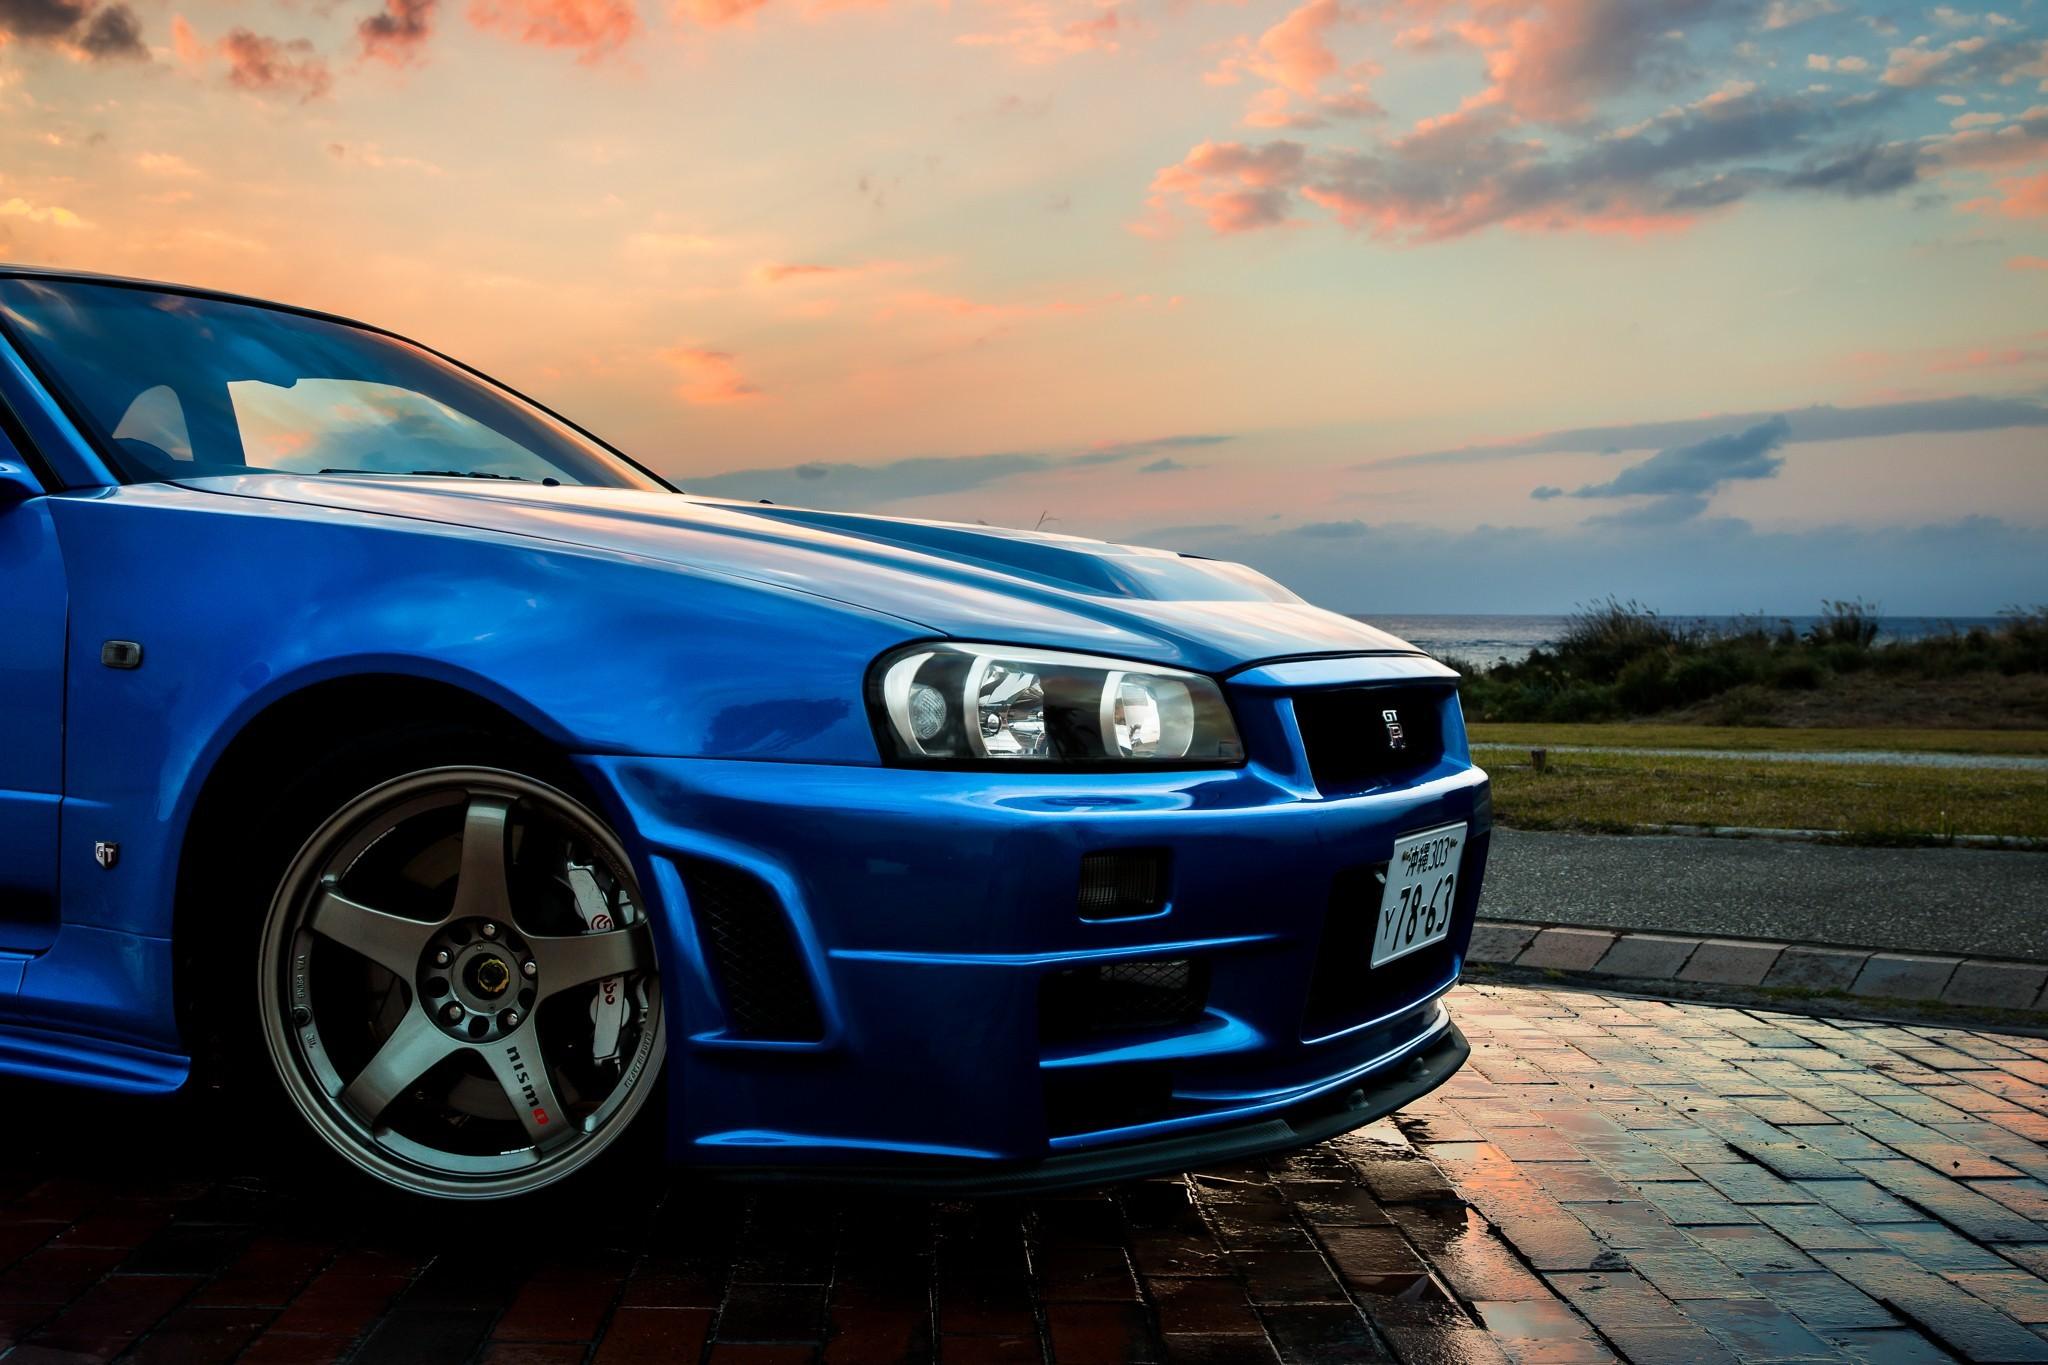 2048x1365 Nissan Skyline GT R R34 Car Blue JDM Wallpapers HD